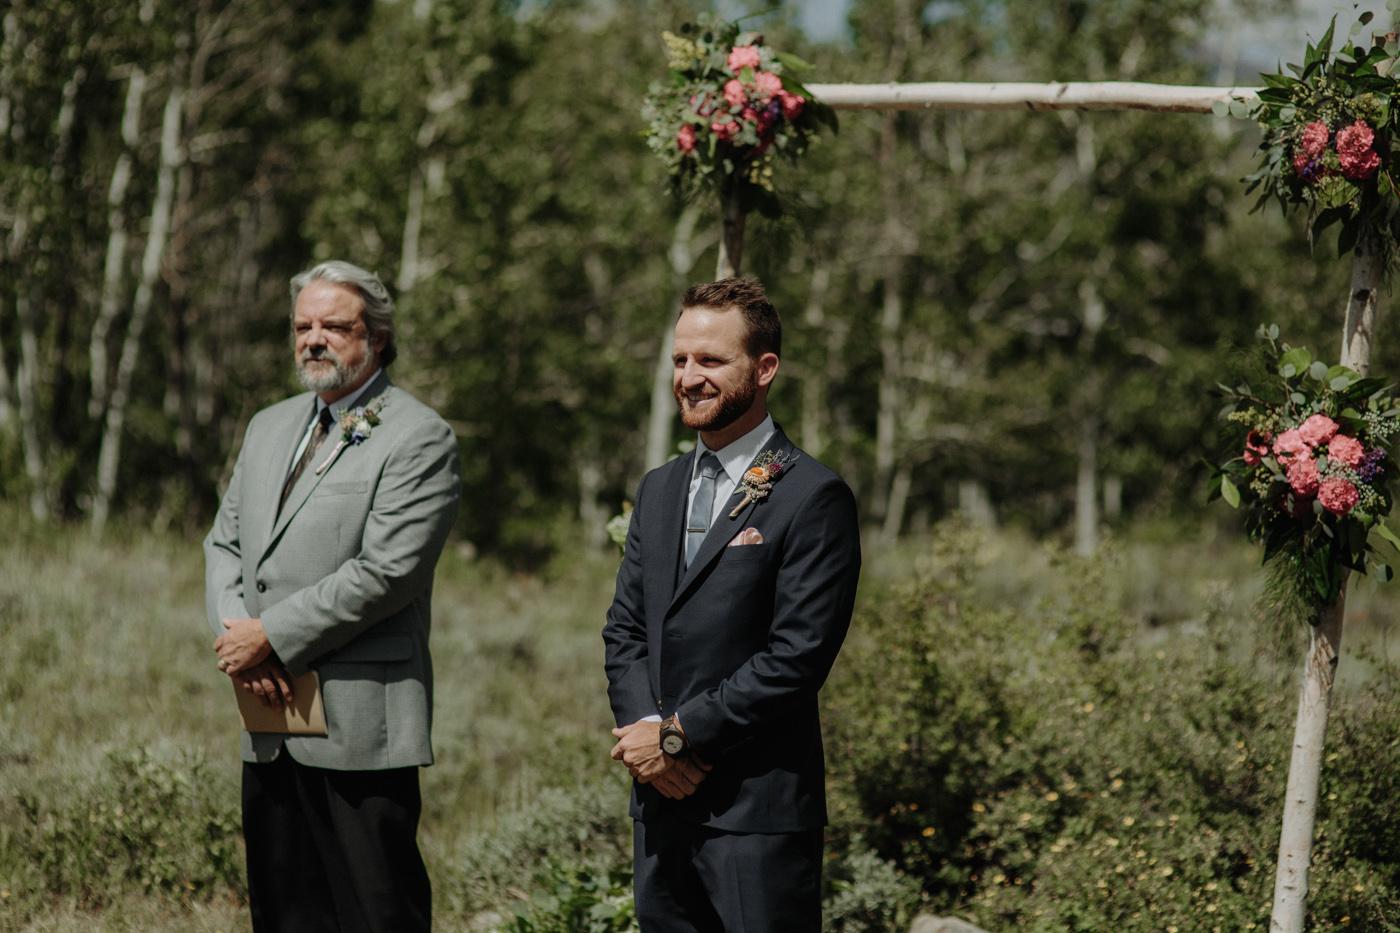 woods-walk-trail-crested-butte-colorado-wedding-25.jpg